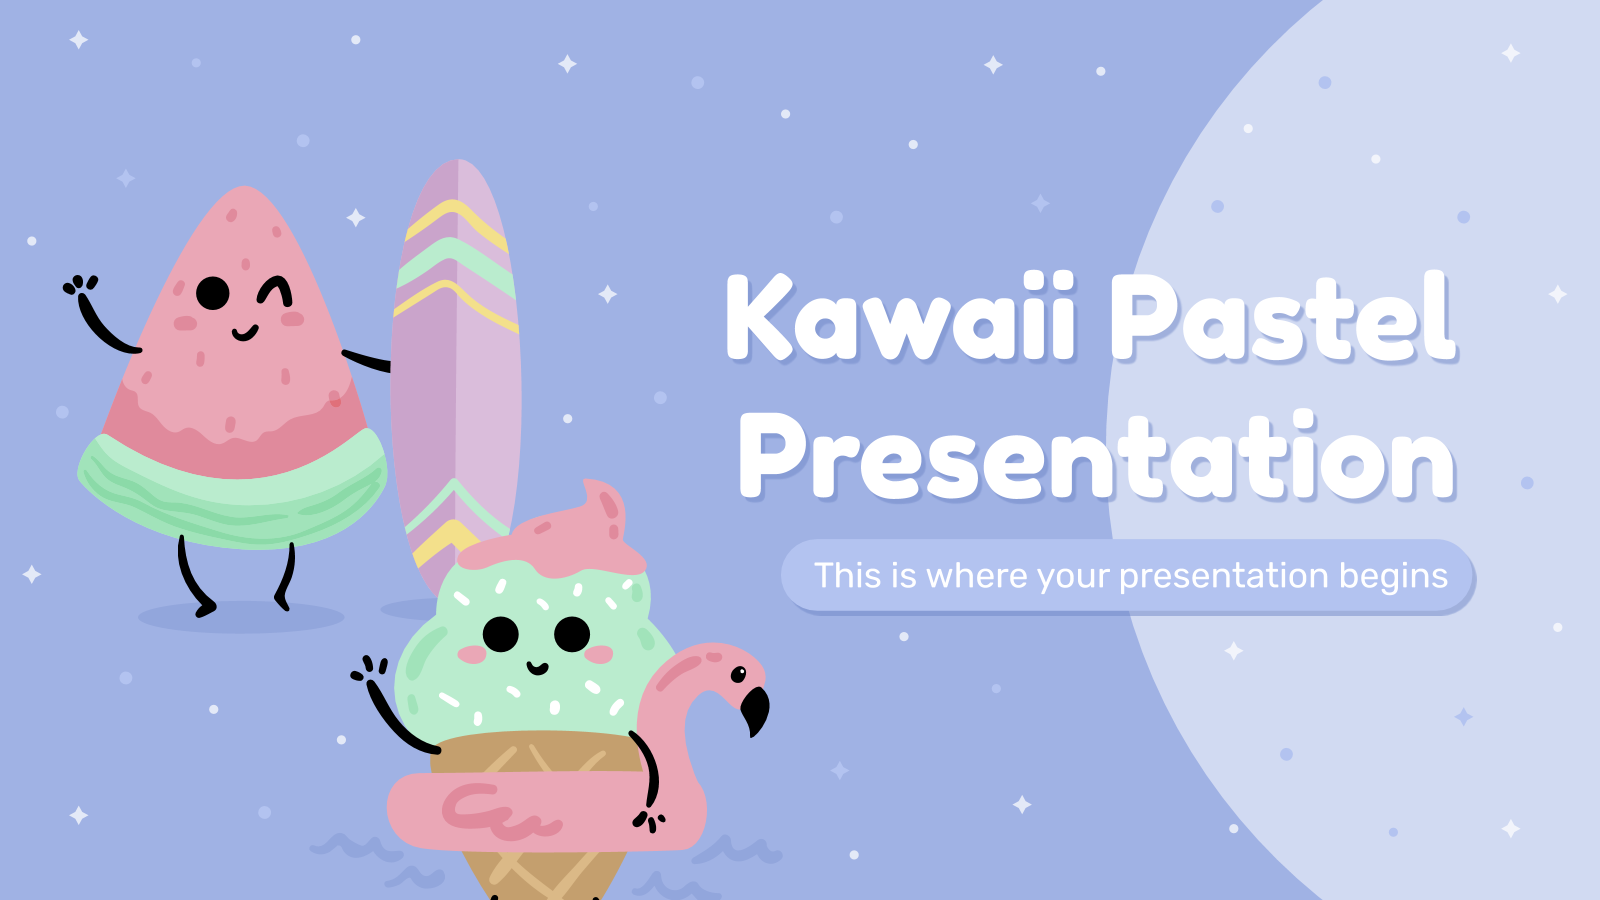 Plantilla de presentación Dulces kawaii con tonos pastel